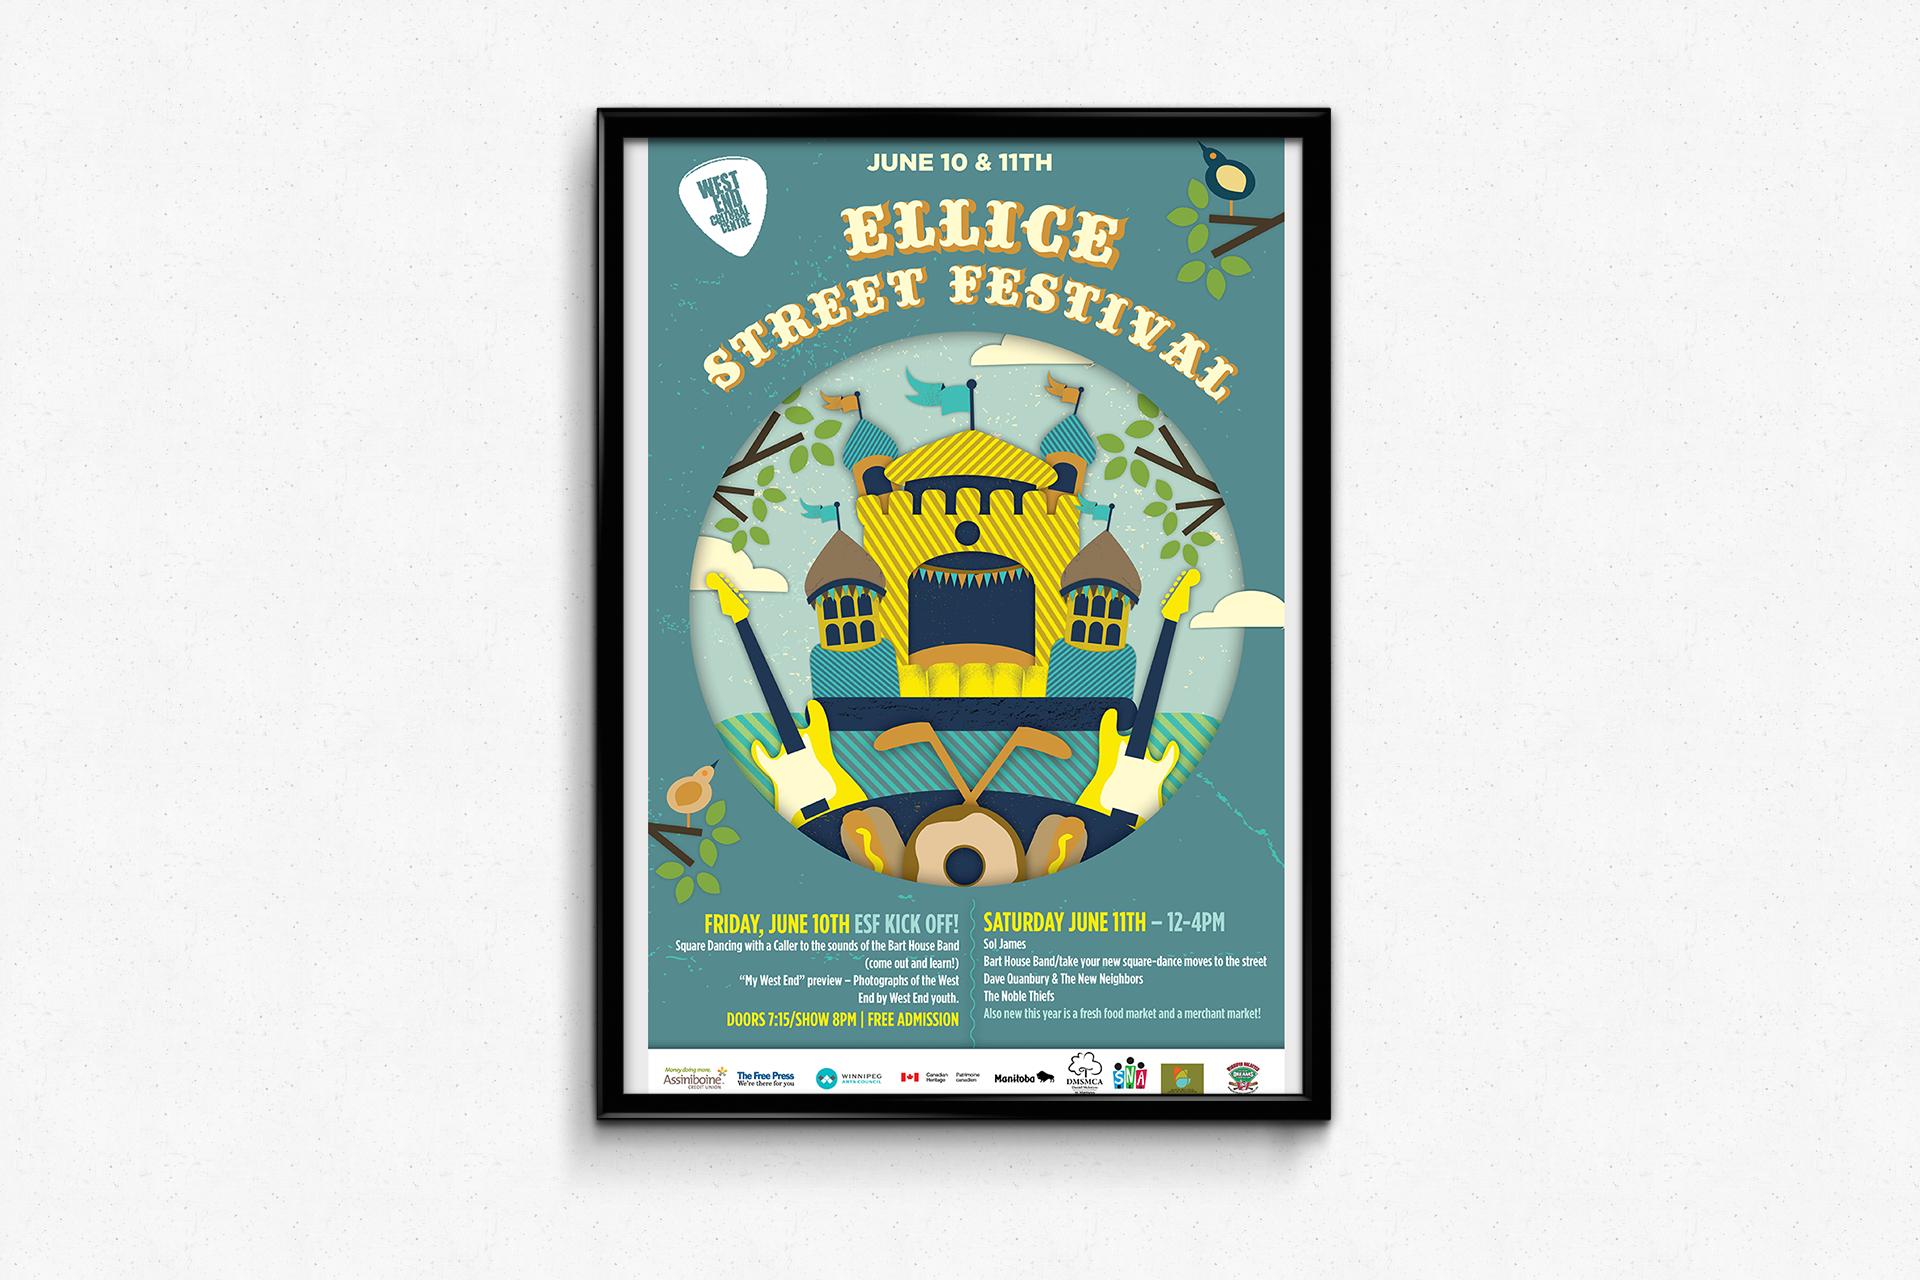 WECC— Ellice Street Festival 2016